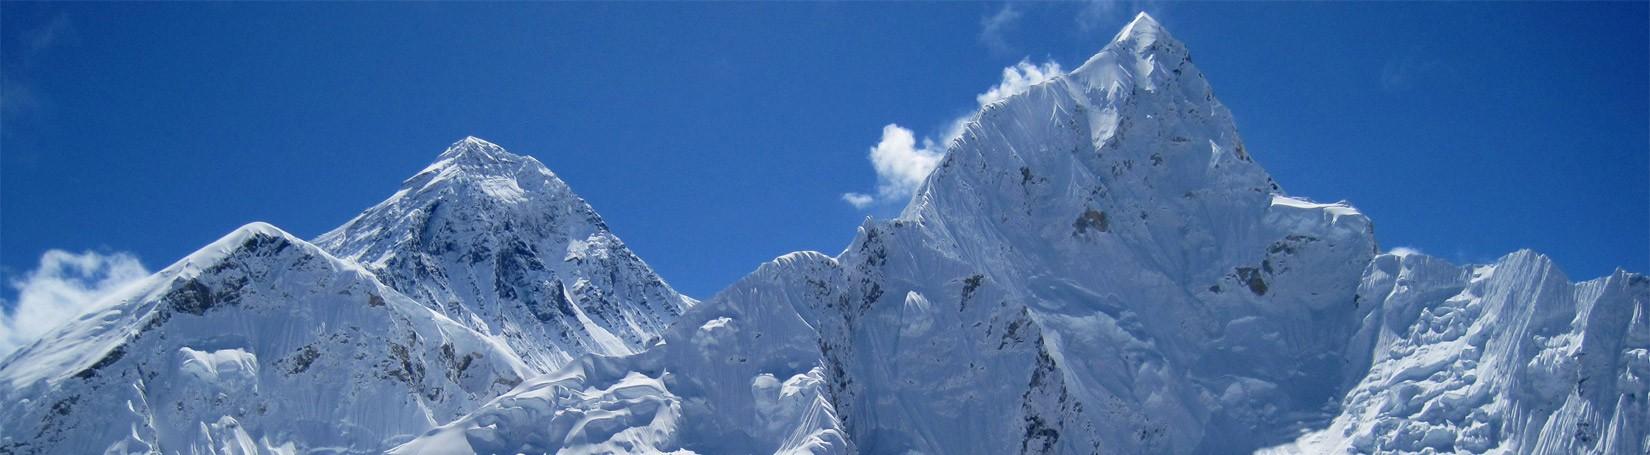 Mount Everest View in Winter season